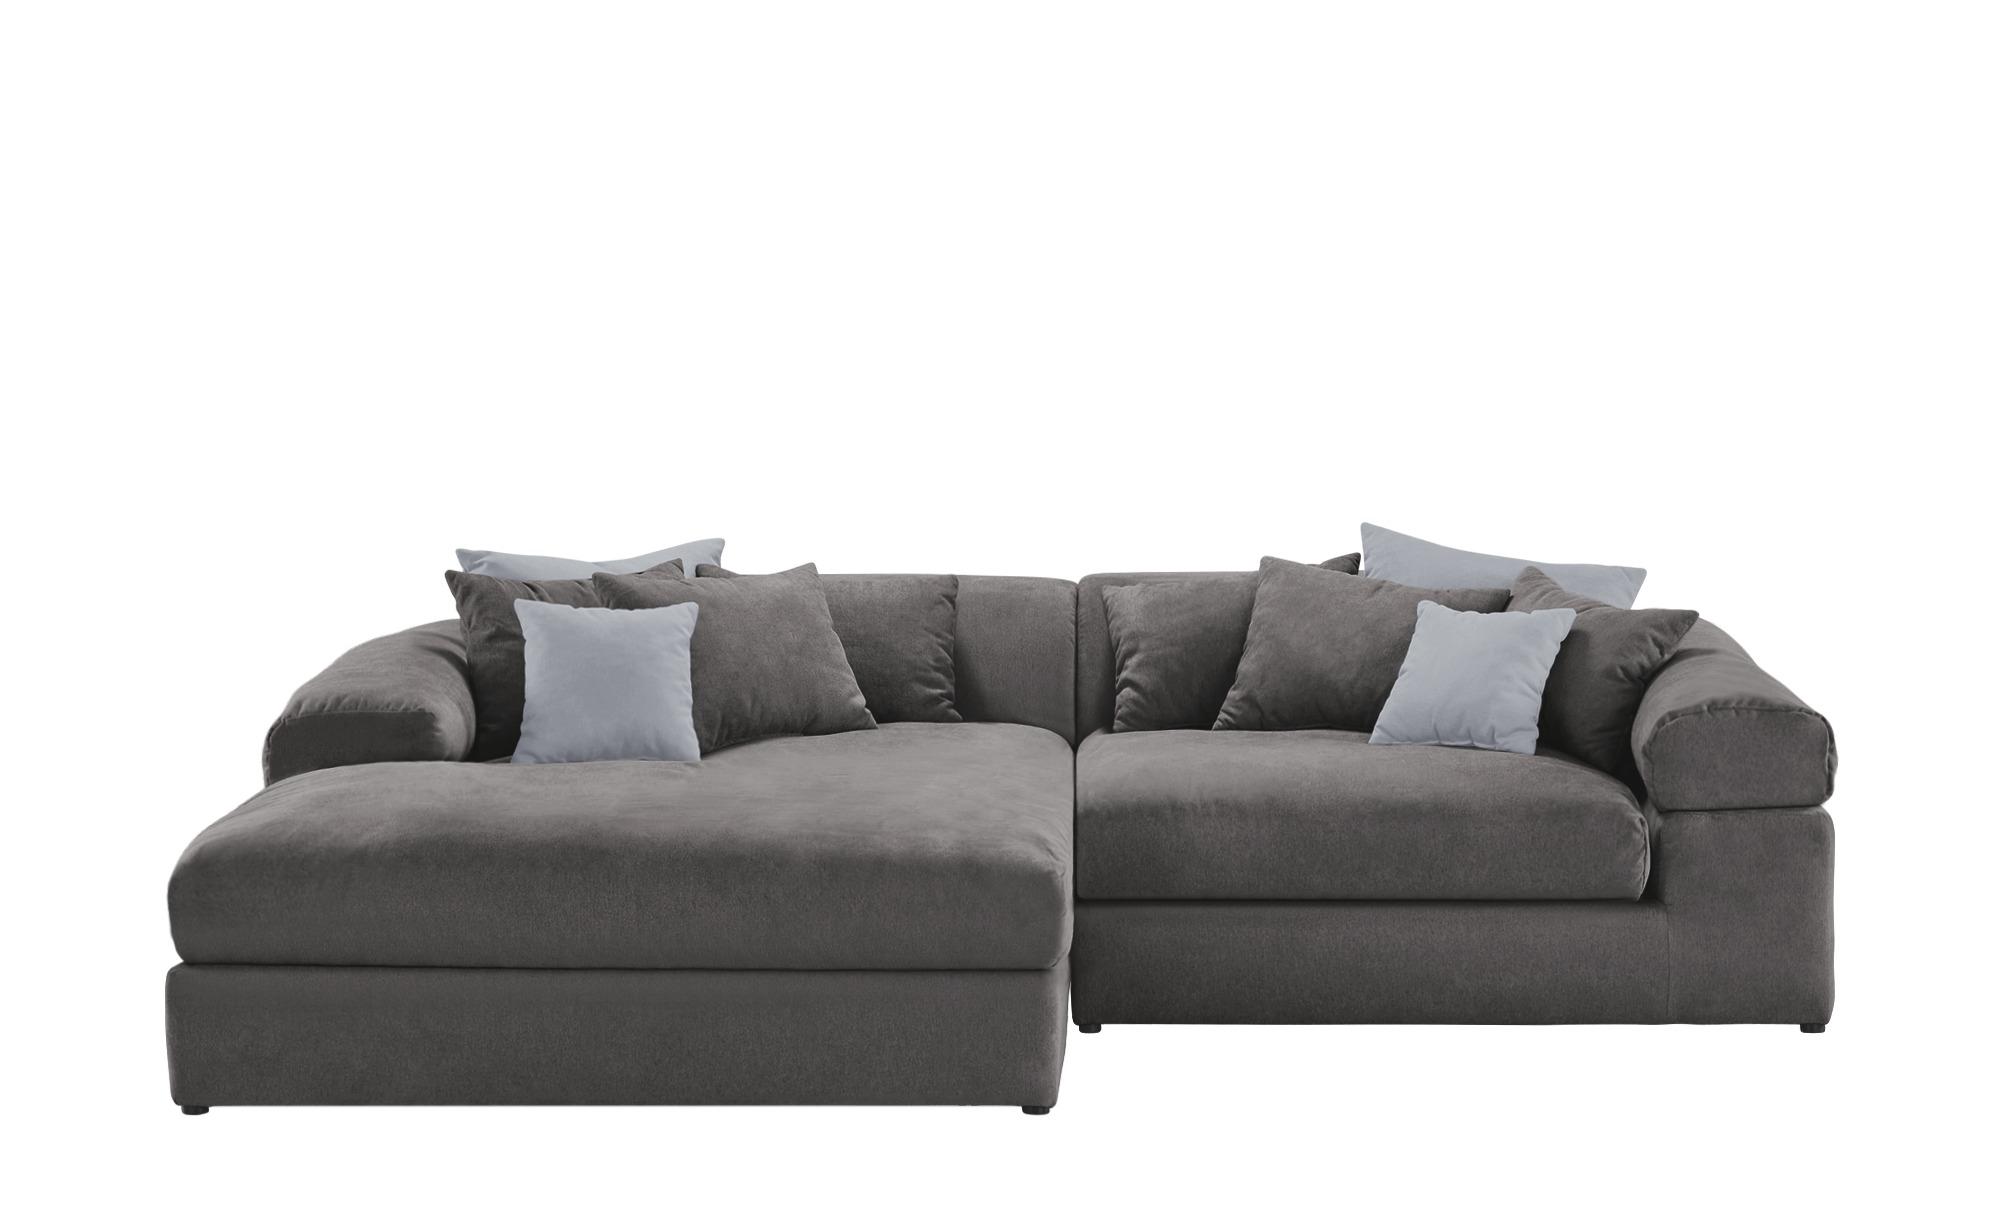 ecksofa leanea breite h he 81 cm grau online kaufen bei. Black Bedroom Furniture Sets. Home Design Ideas